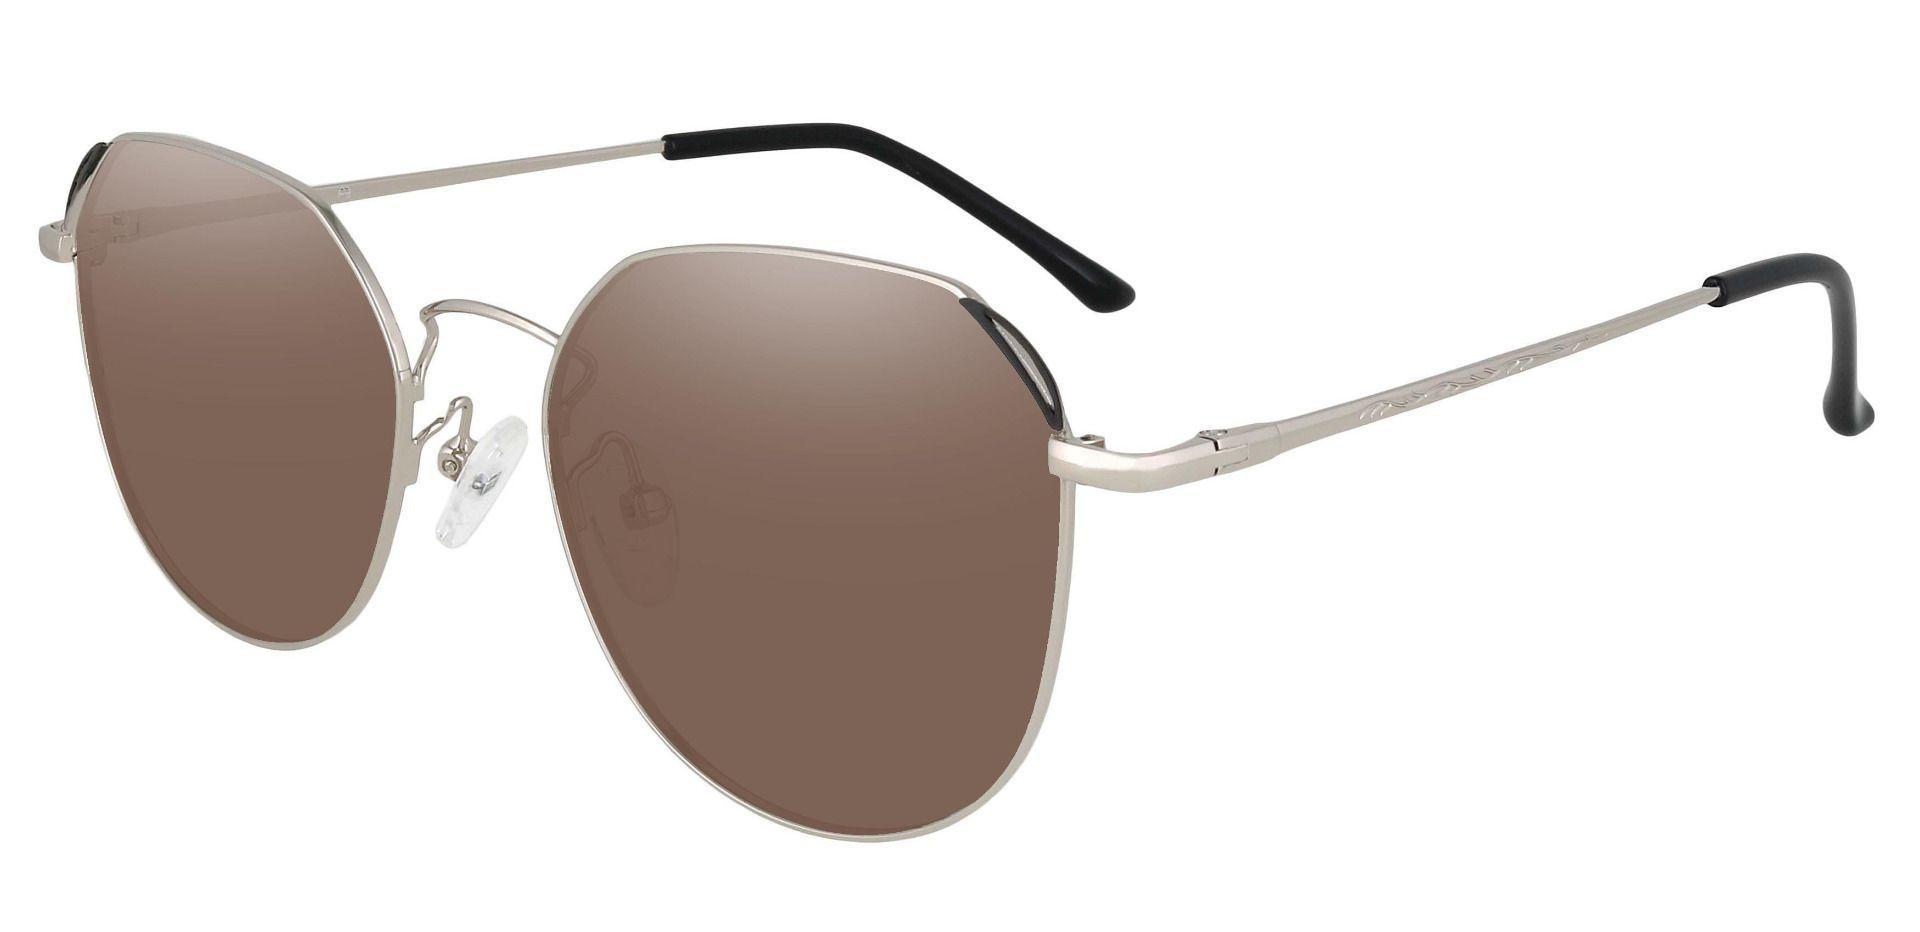 Figaro Geometric Progressive Sunglasses - Silver Frame With Brown Lenses